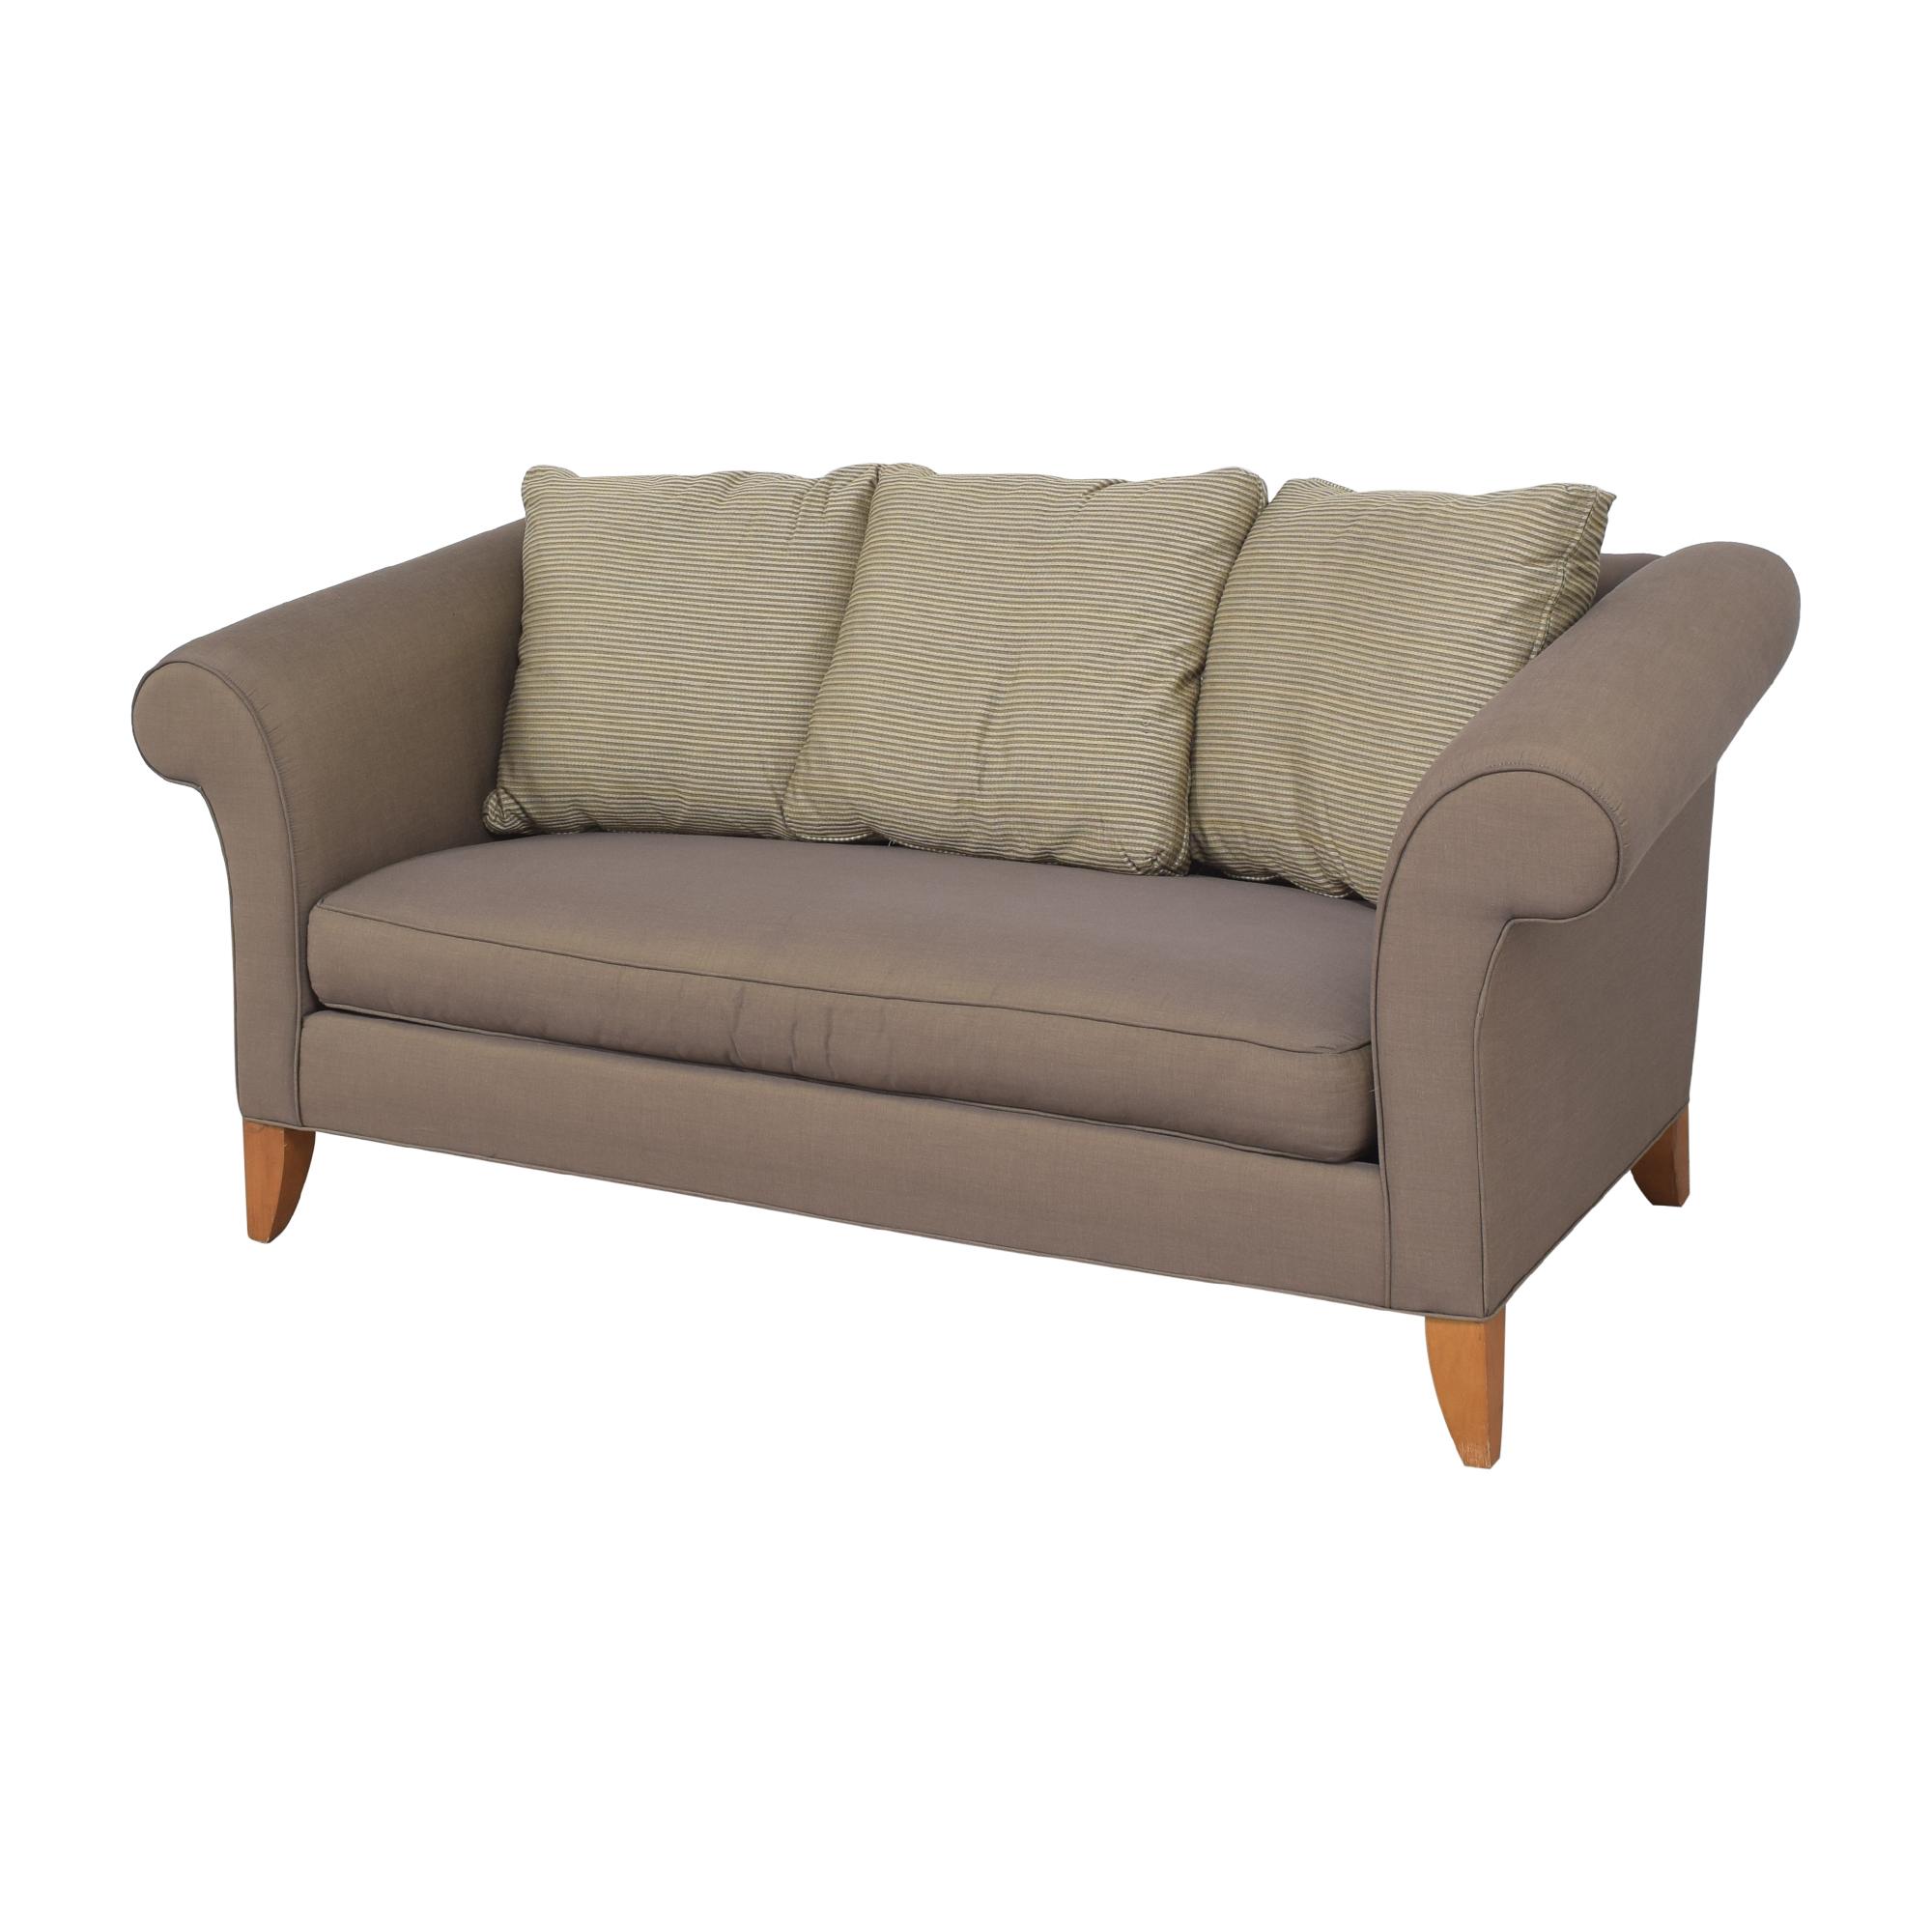 Ethan Allen Ethan Allen Shelter Sofa dimensions